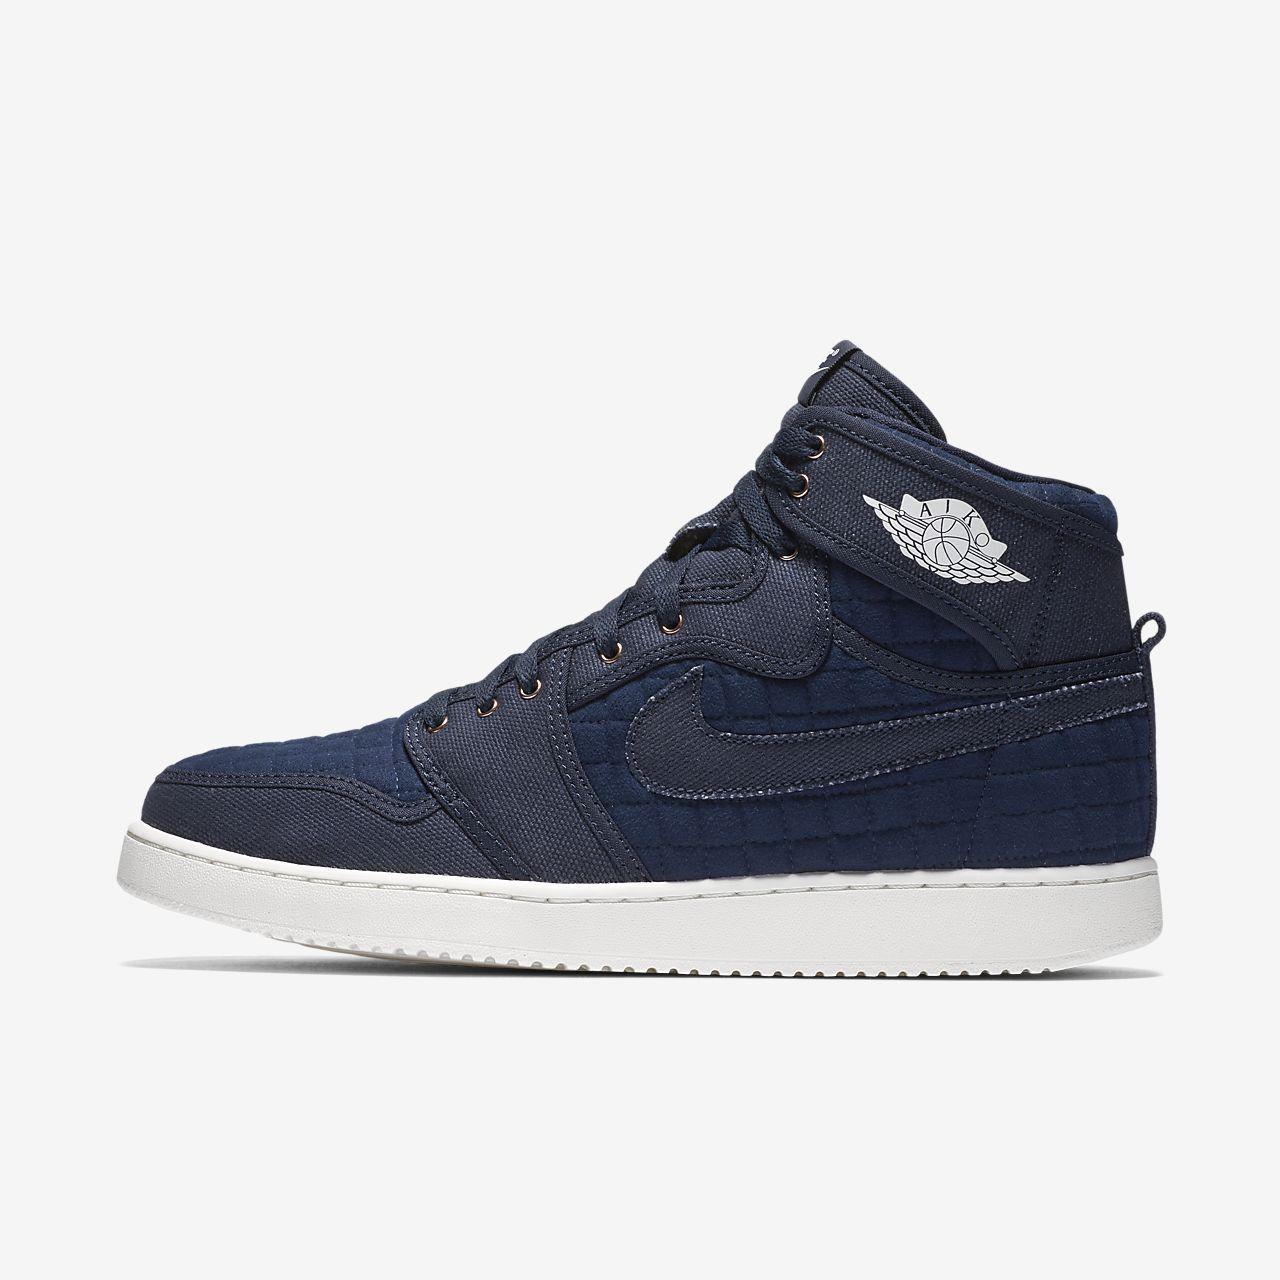 11fa49a258b593 Air Jordan 1 KO High OG Men s Shoe. Nike.com ZA